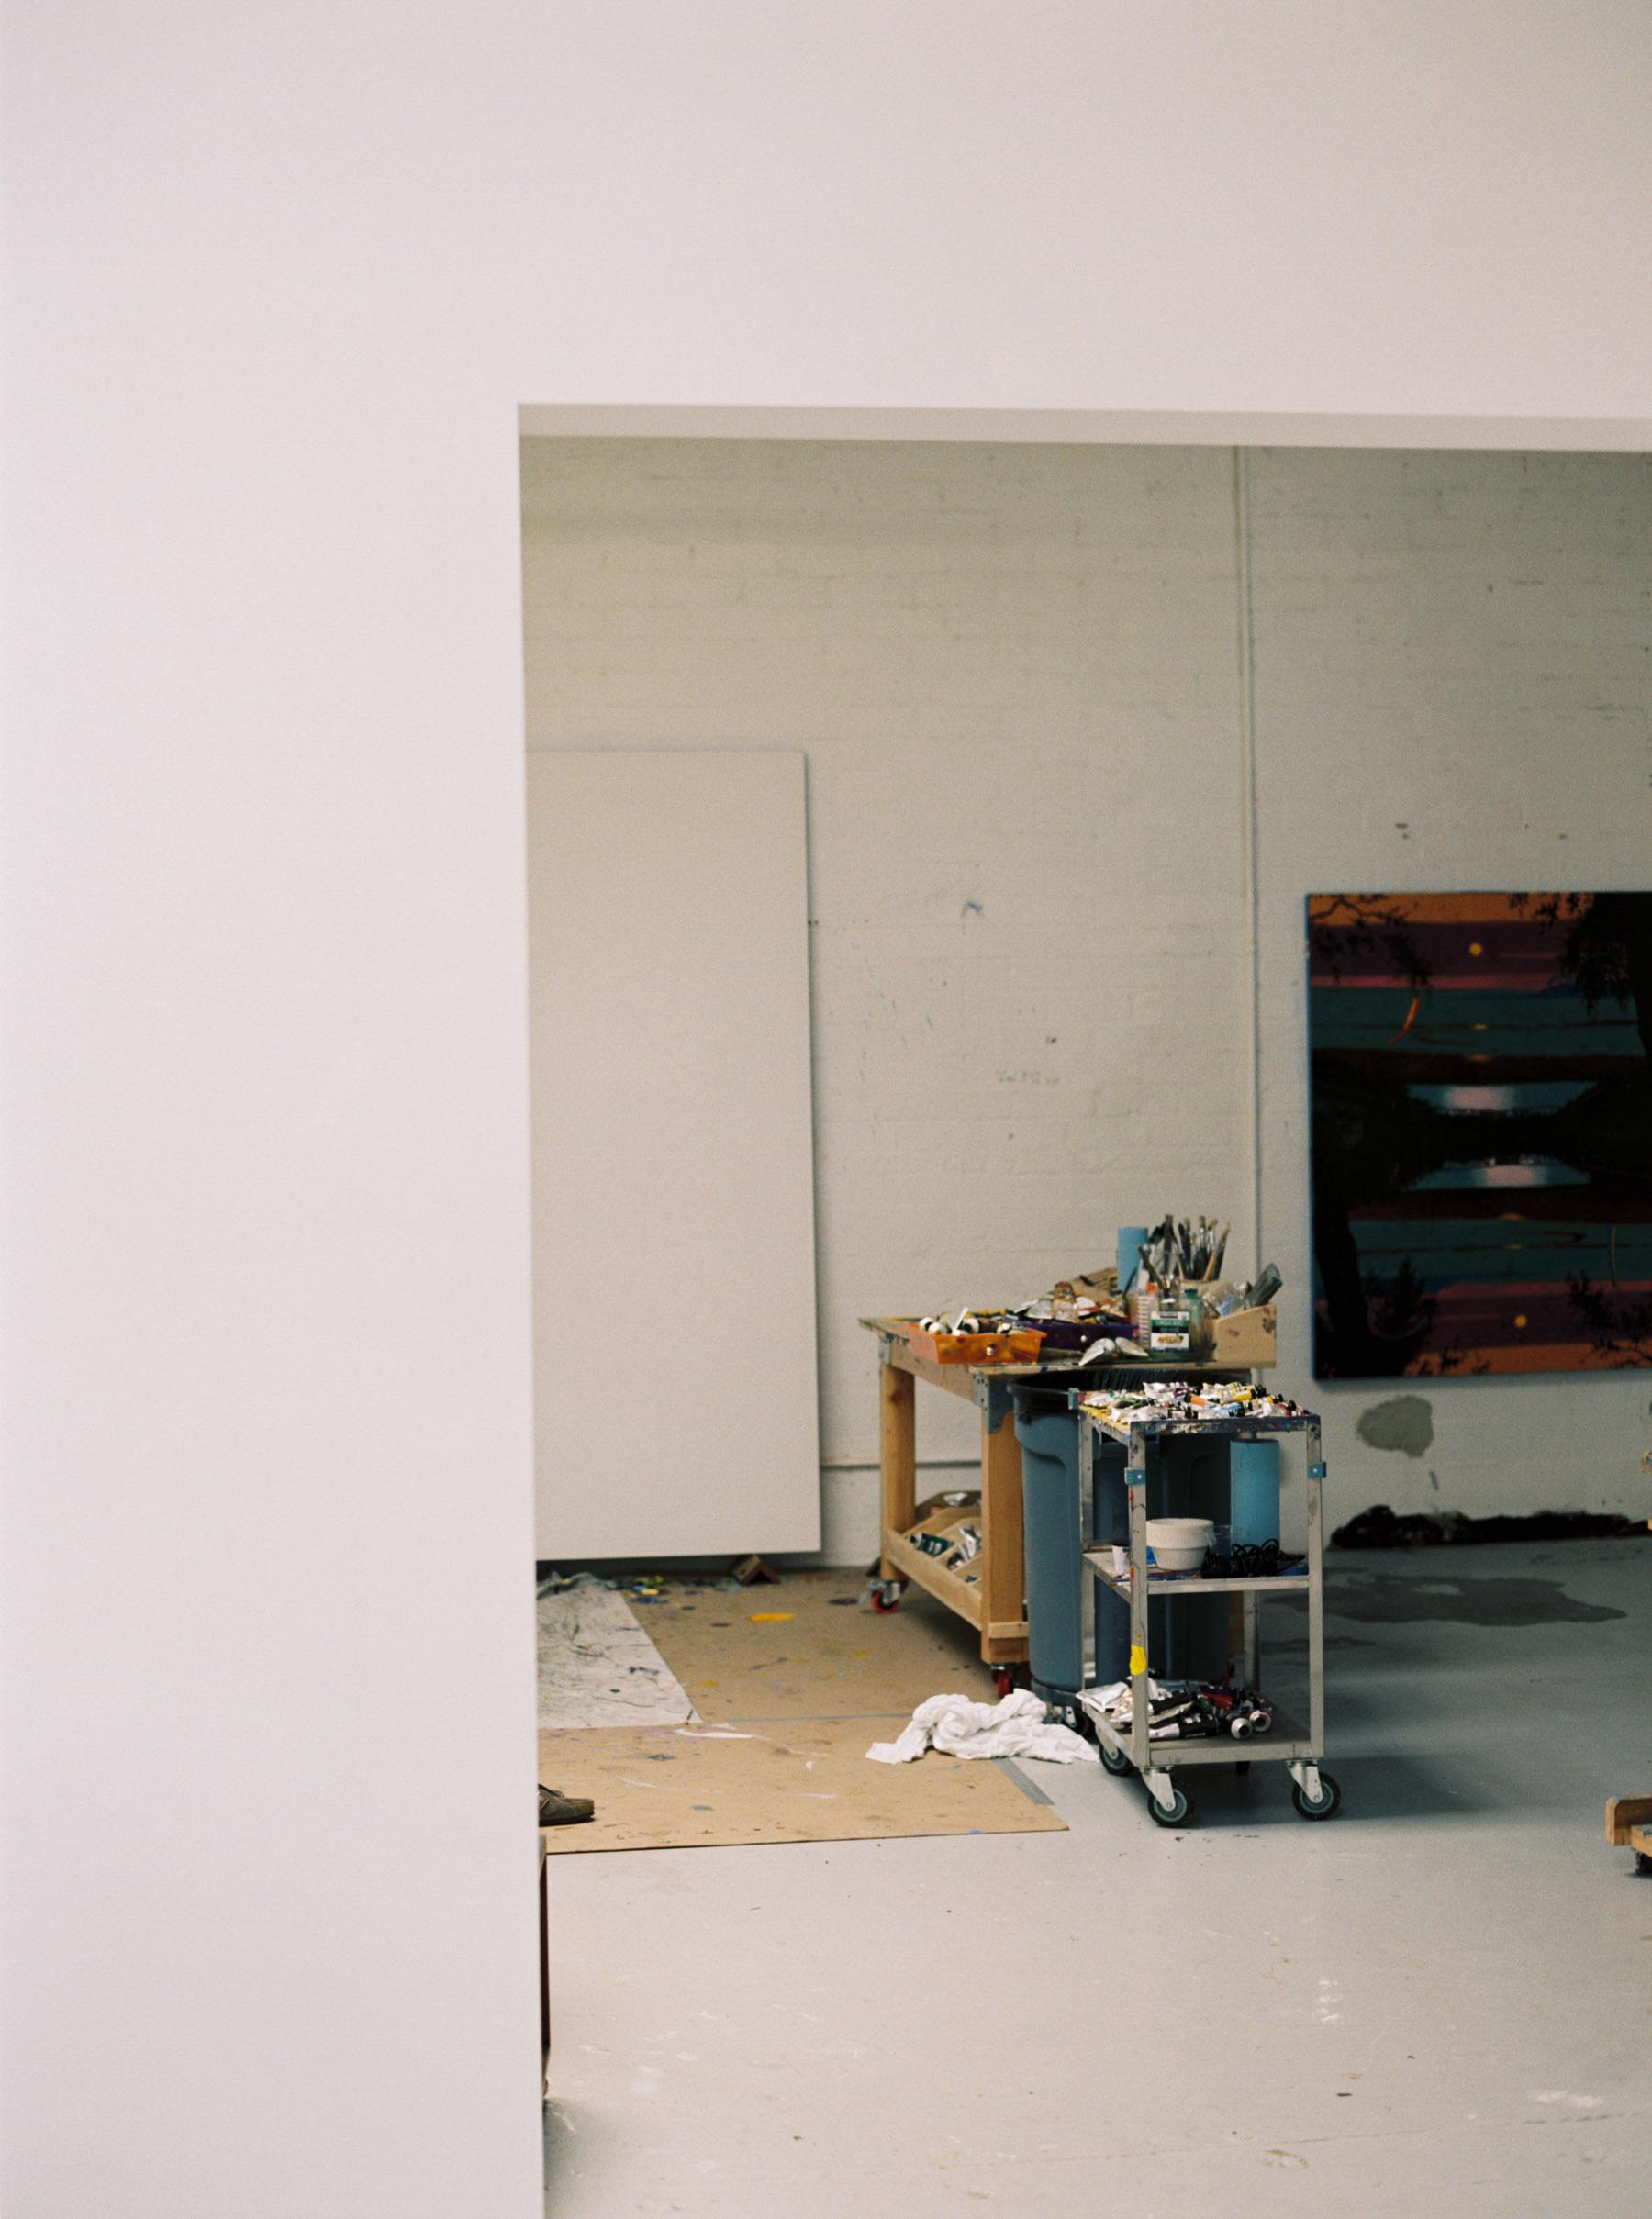 Artist, Artist Profile, Avant Arte, California, Friedrich Kunath, Justin Chung, Kodak, Los Angeles, Studio Visit